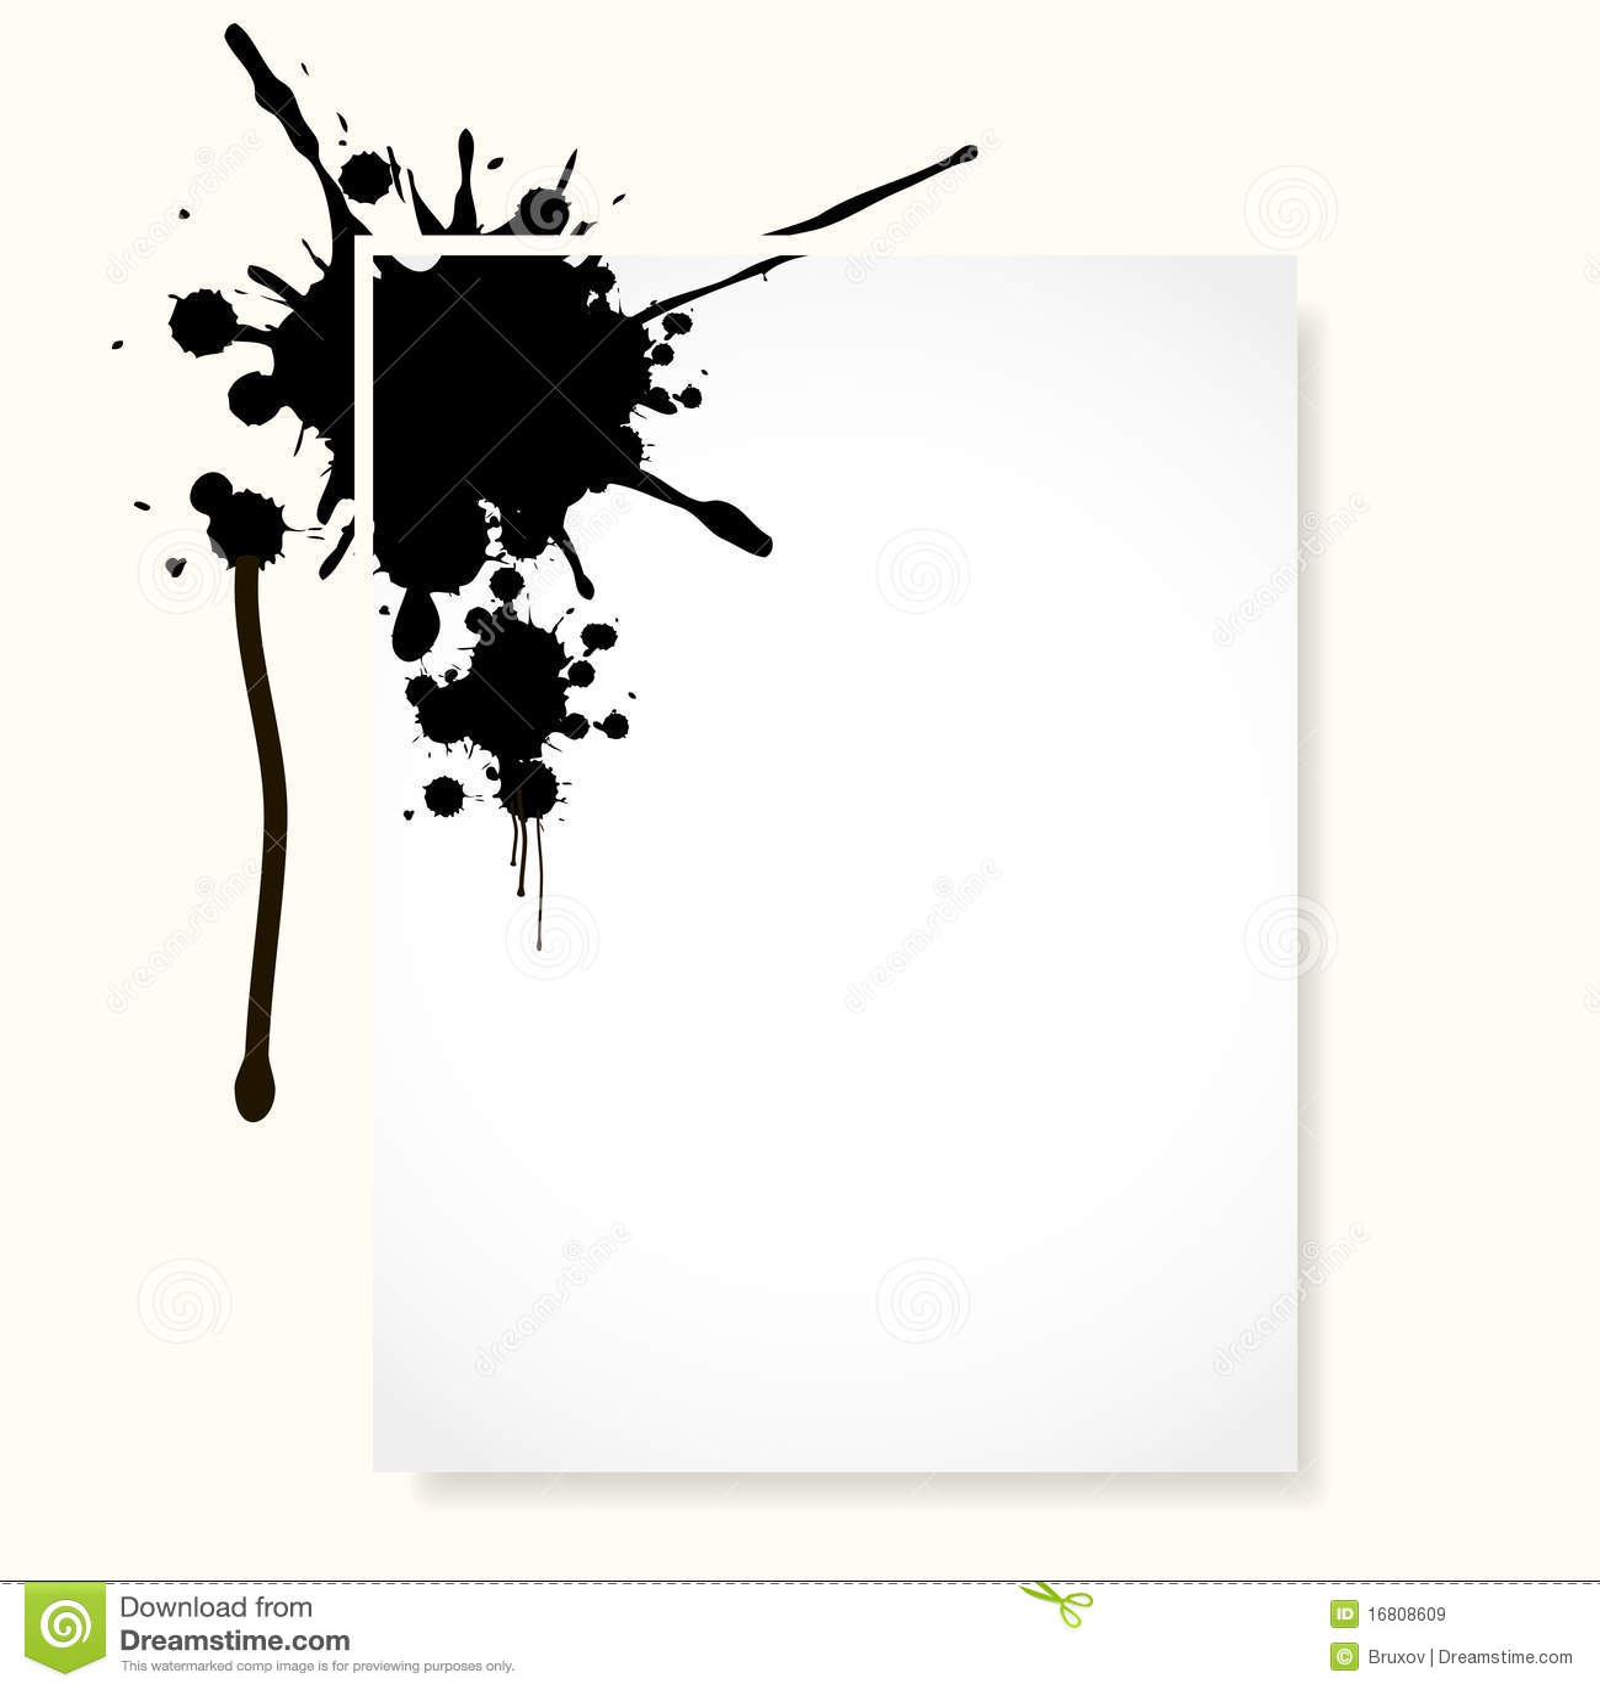 Sheet with inkblot